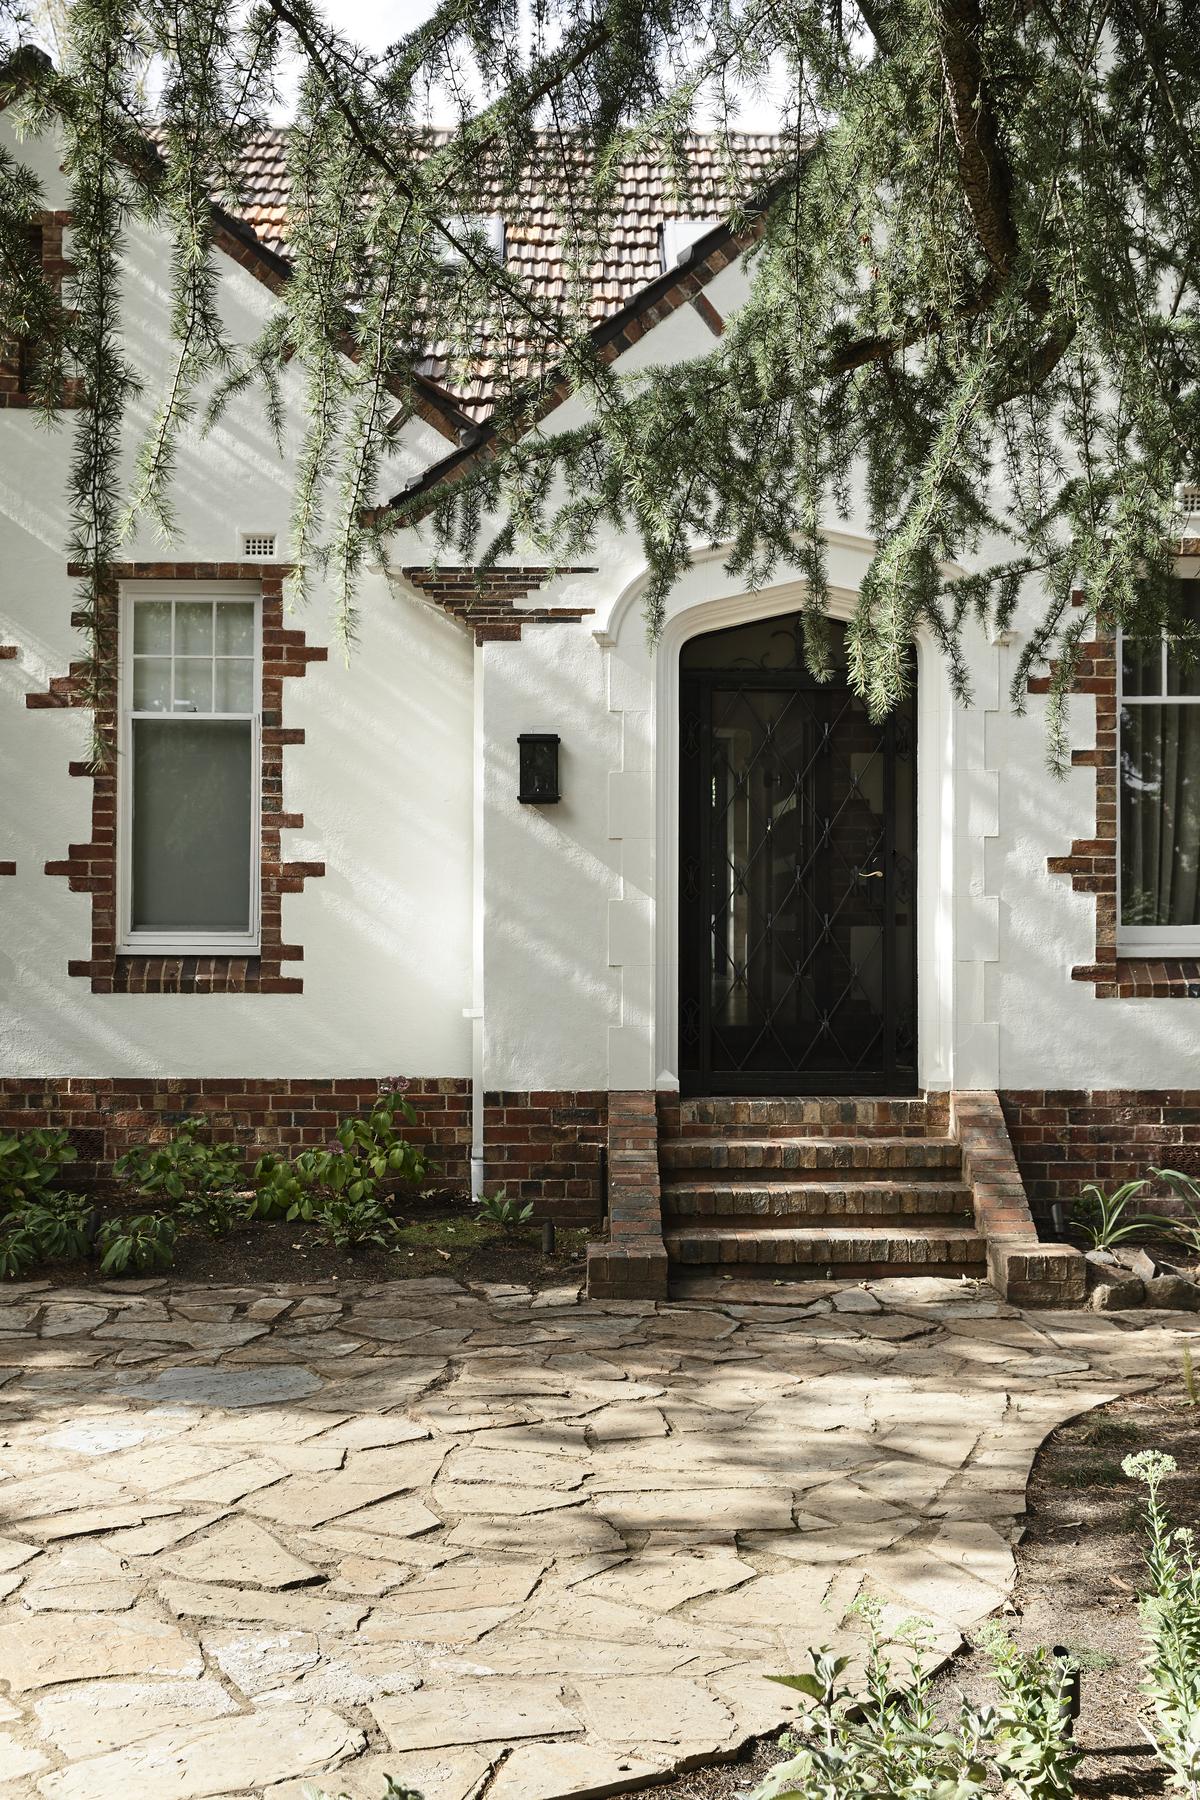 Malvern Garden House | Design: Taylor Knights | Photography: Derek Swalwell | Builtworks.com.au